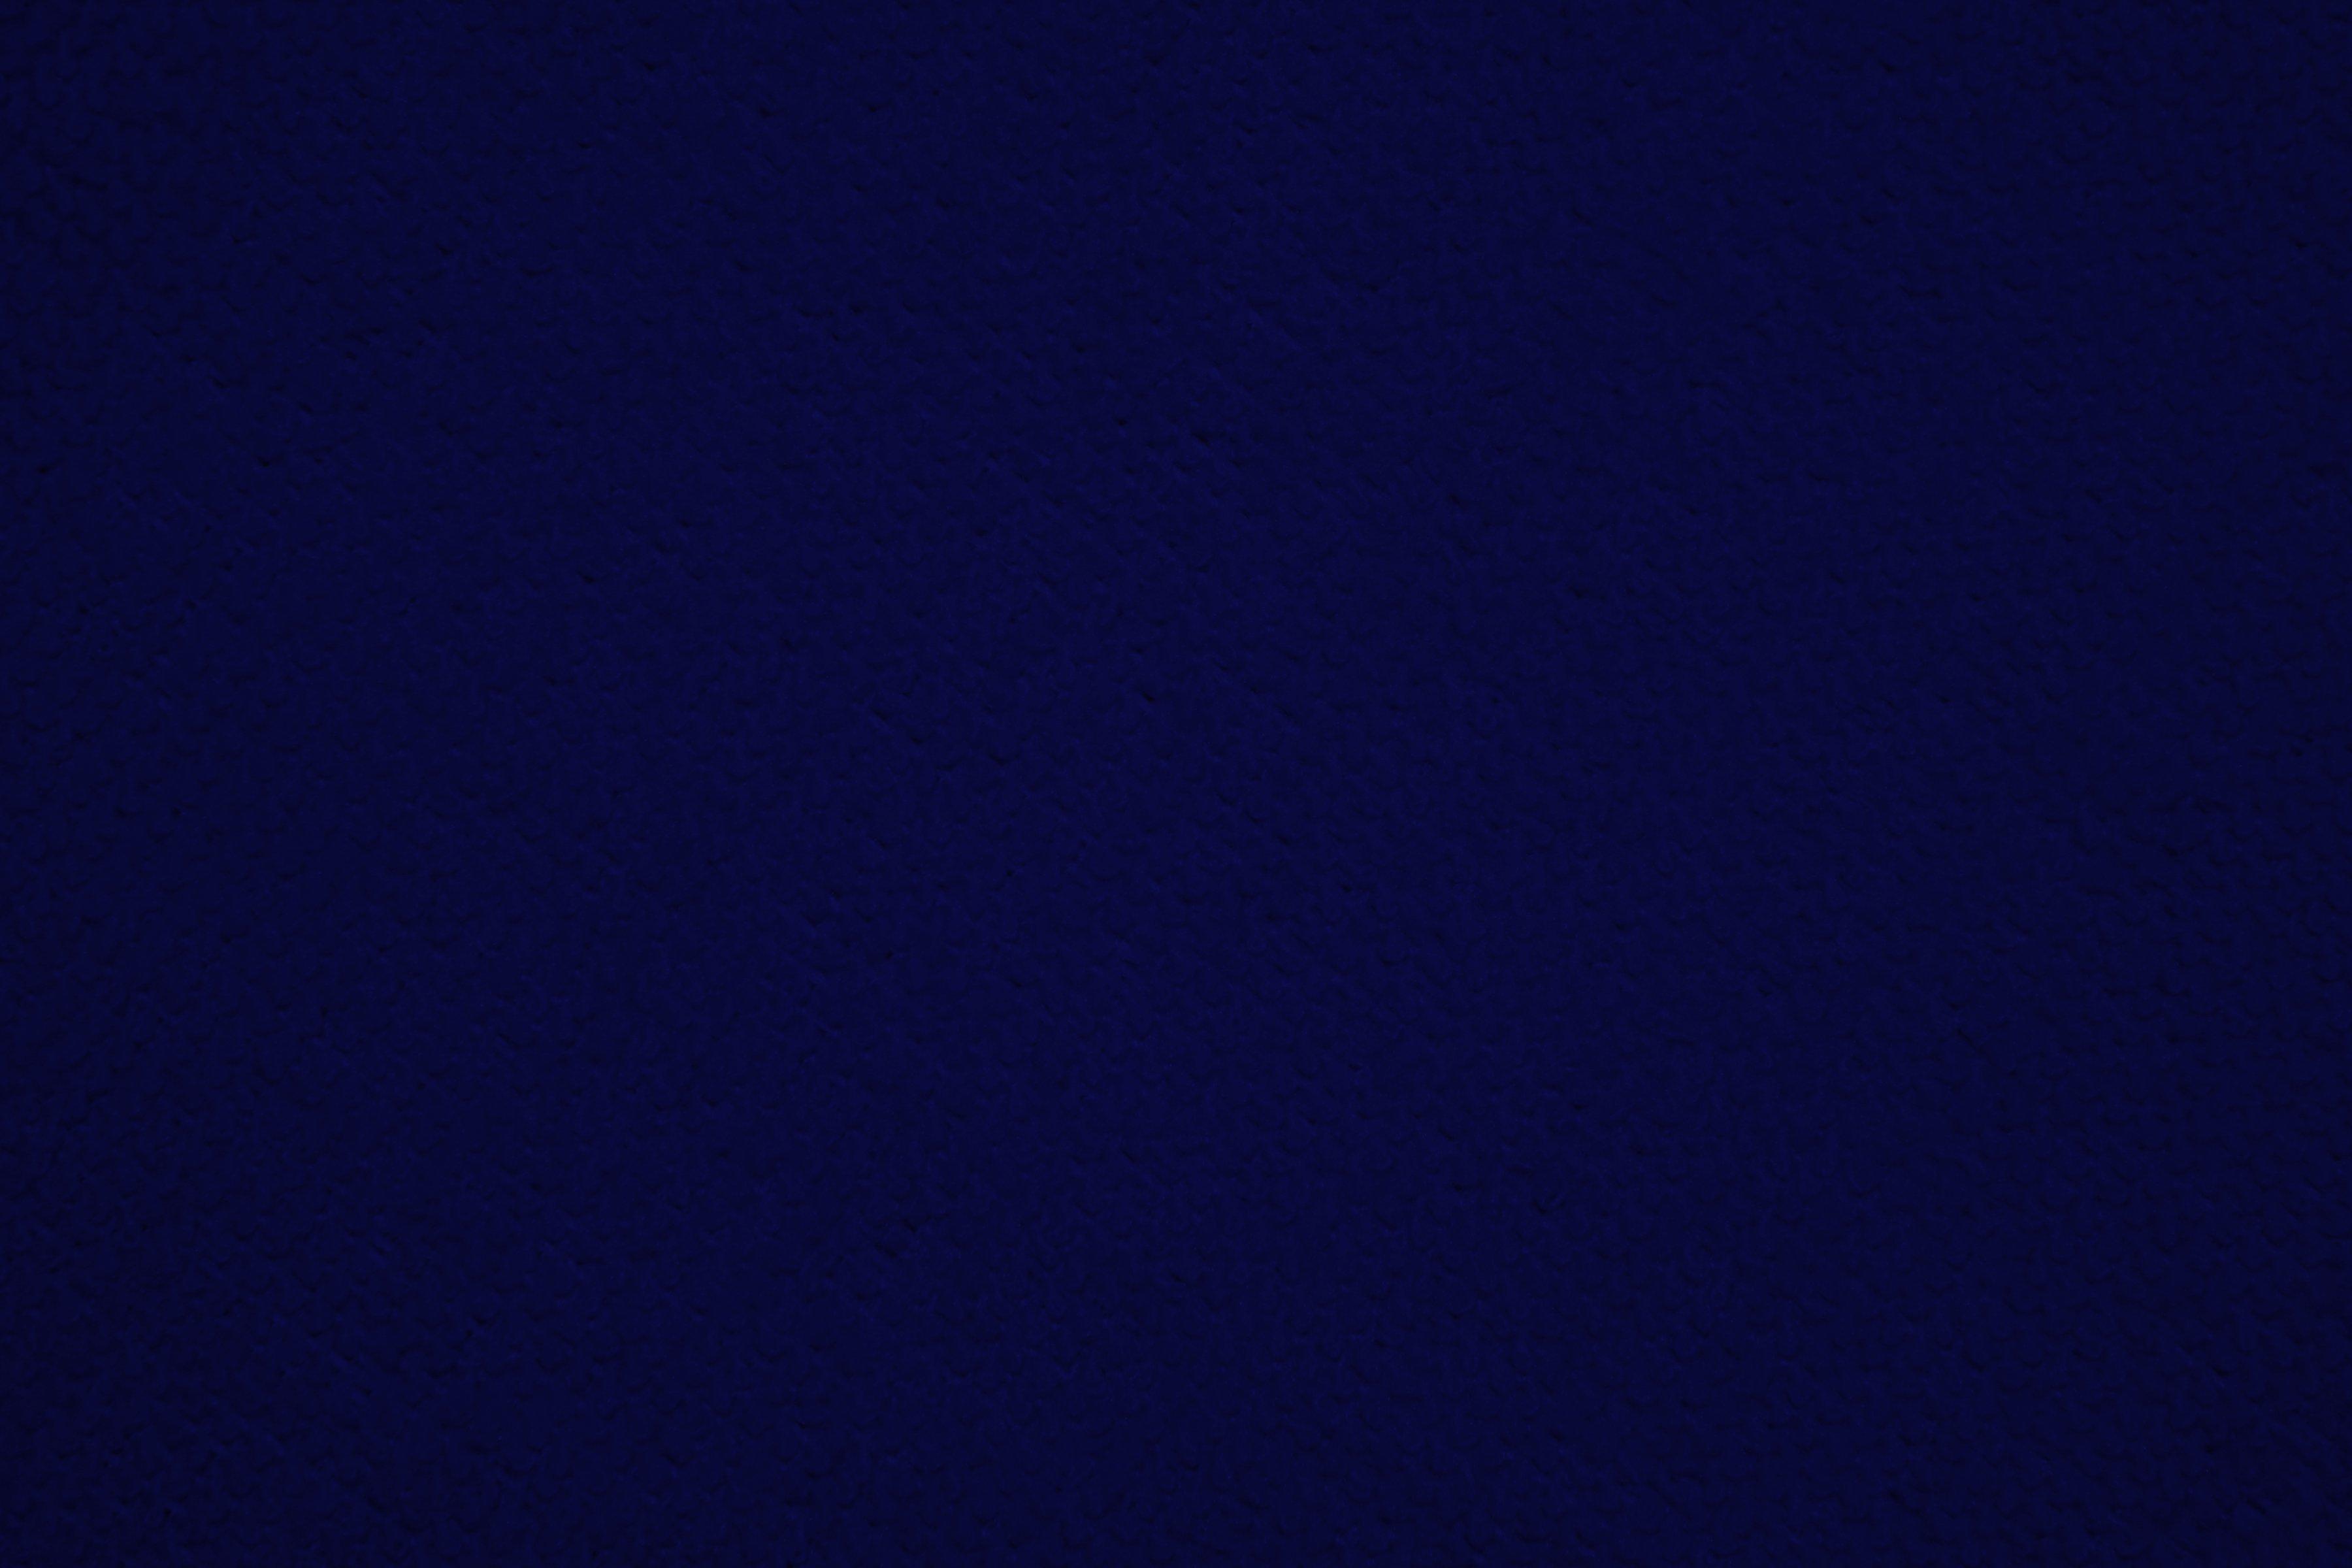 Navy Blue Wallpaper  Hd Wallpapers Pulse. Living Room Furniture Brisbane. Furniture Ashley Living Room. Wall Units Living Room Furniture. Contemporary Living Room Sets. Christmas Decoration In Living Room. Formal Curtains Living Room. Living Room Cabinets. Living Room Canidate